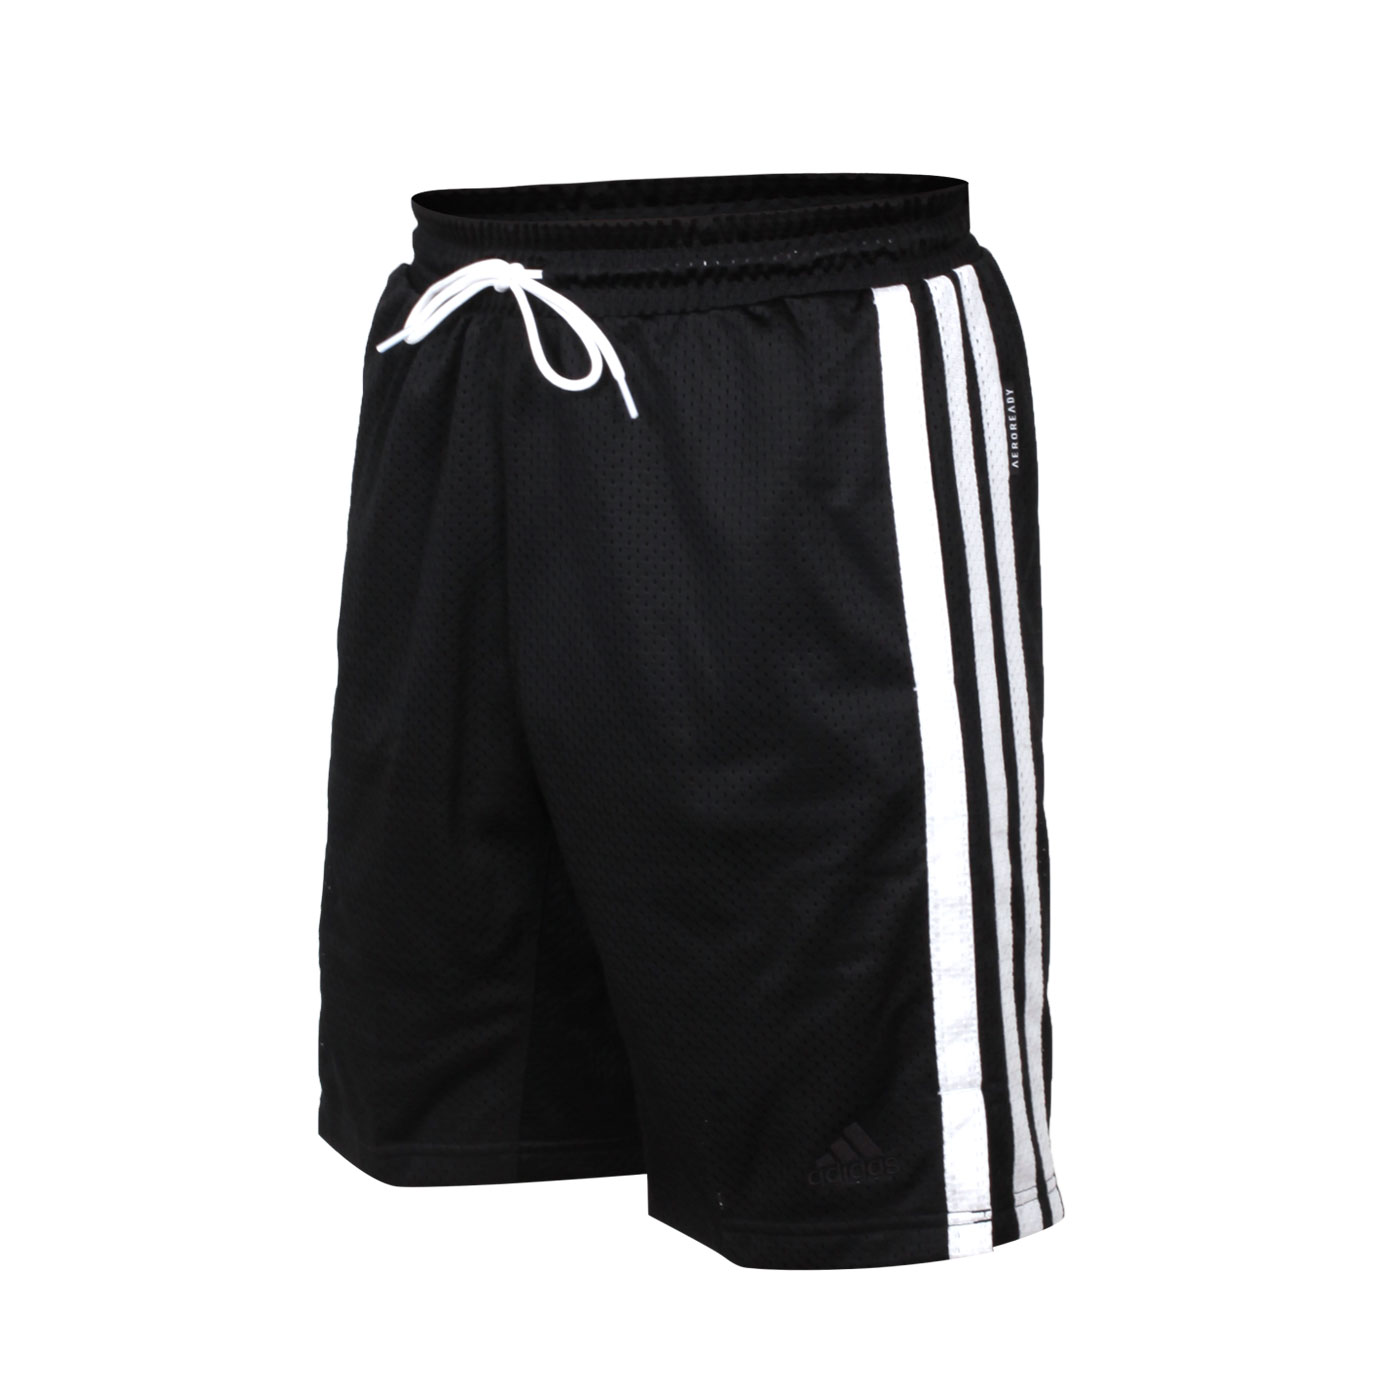 ADIDAS 男款運動短褲 GK8382 - 黑白